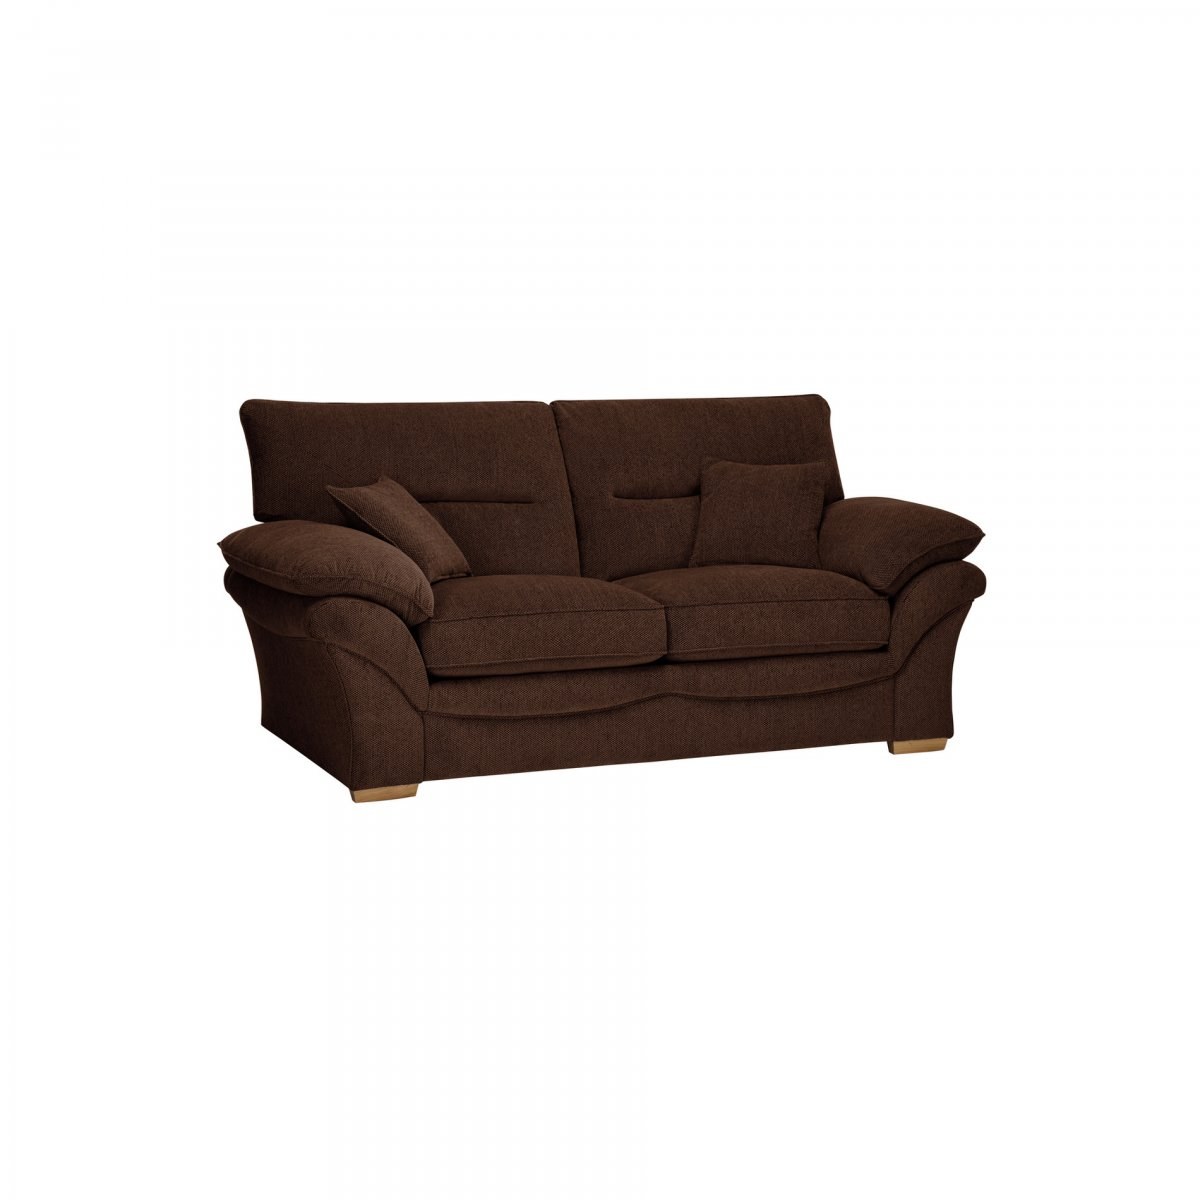 standard sofa cushion size bianca futon bed chloe 2 seater in brown fabric